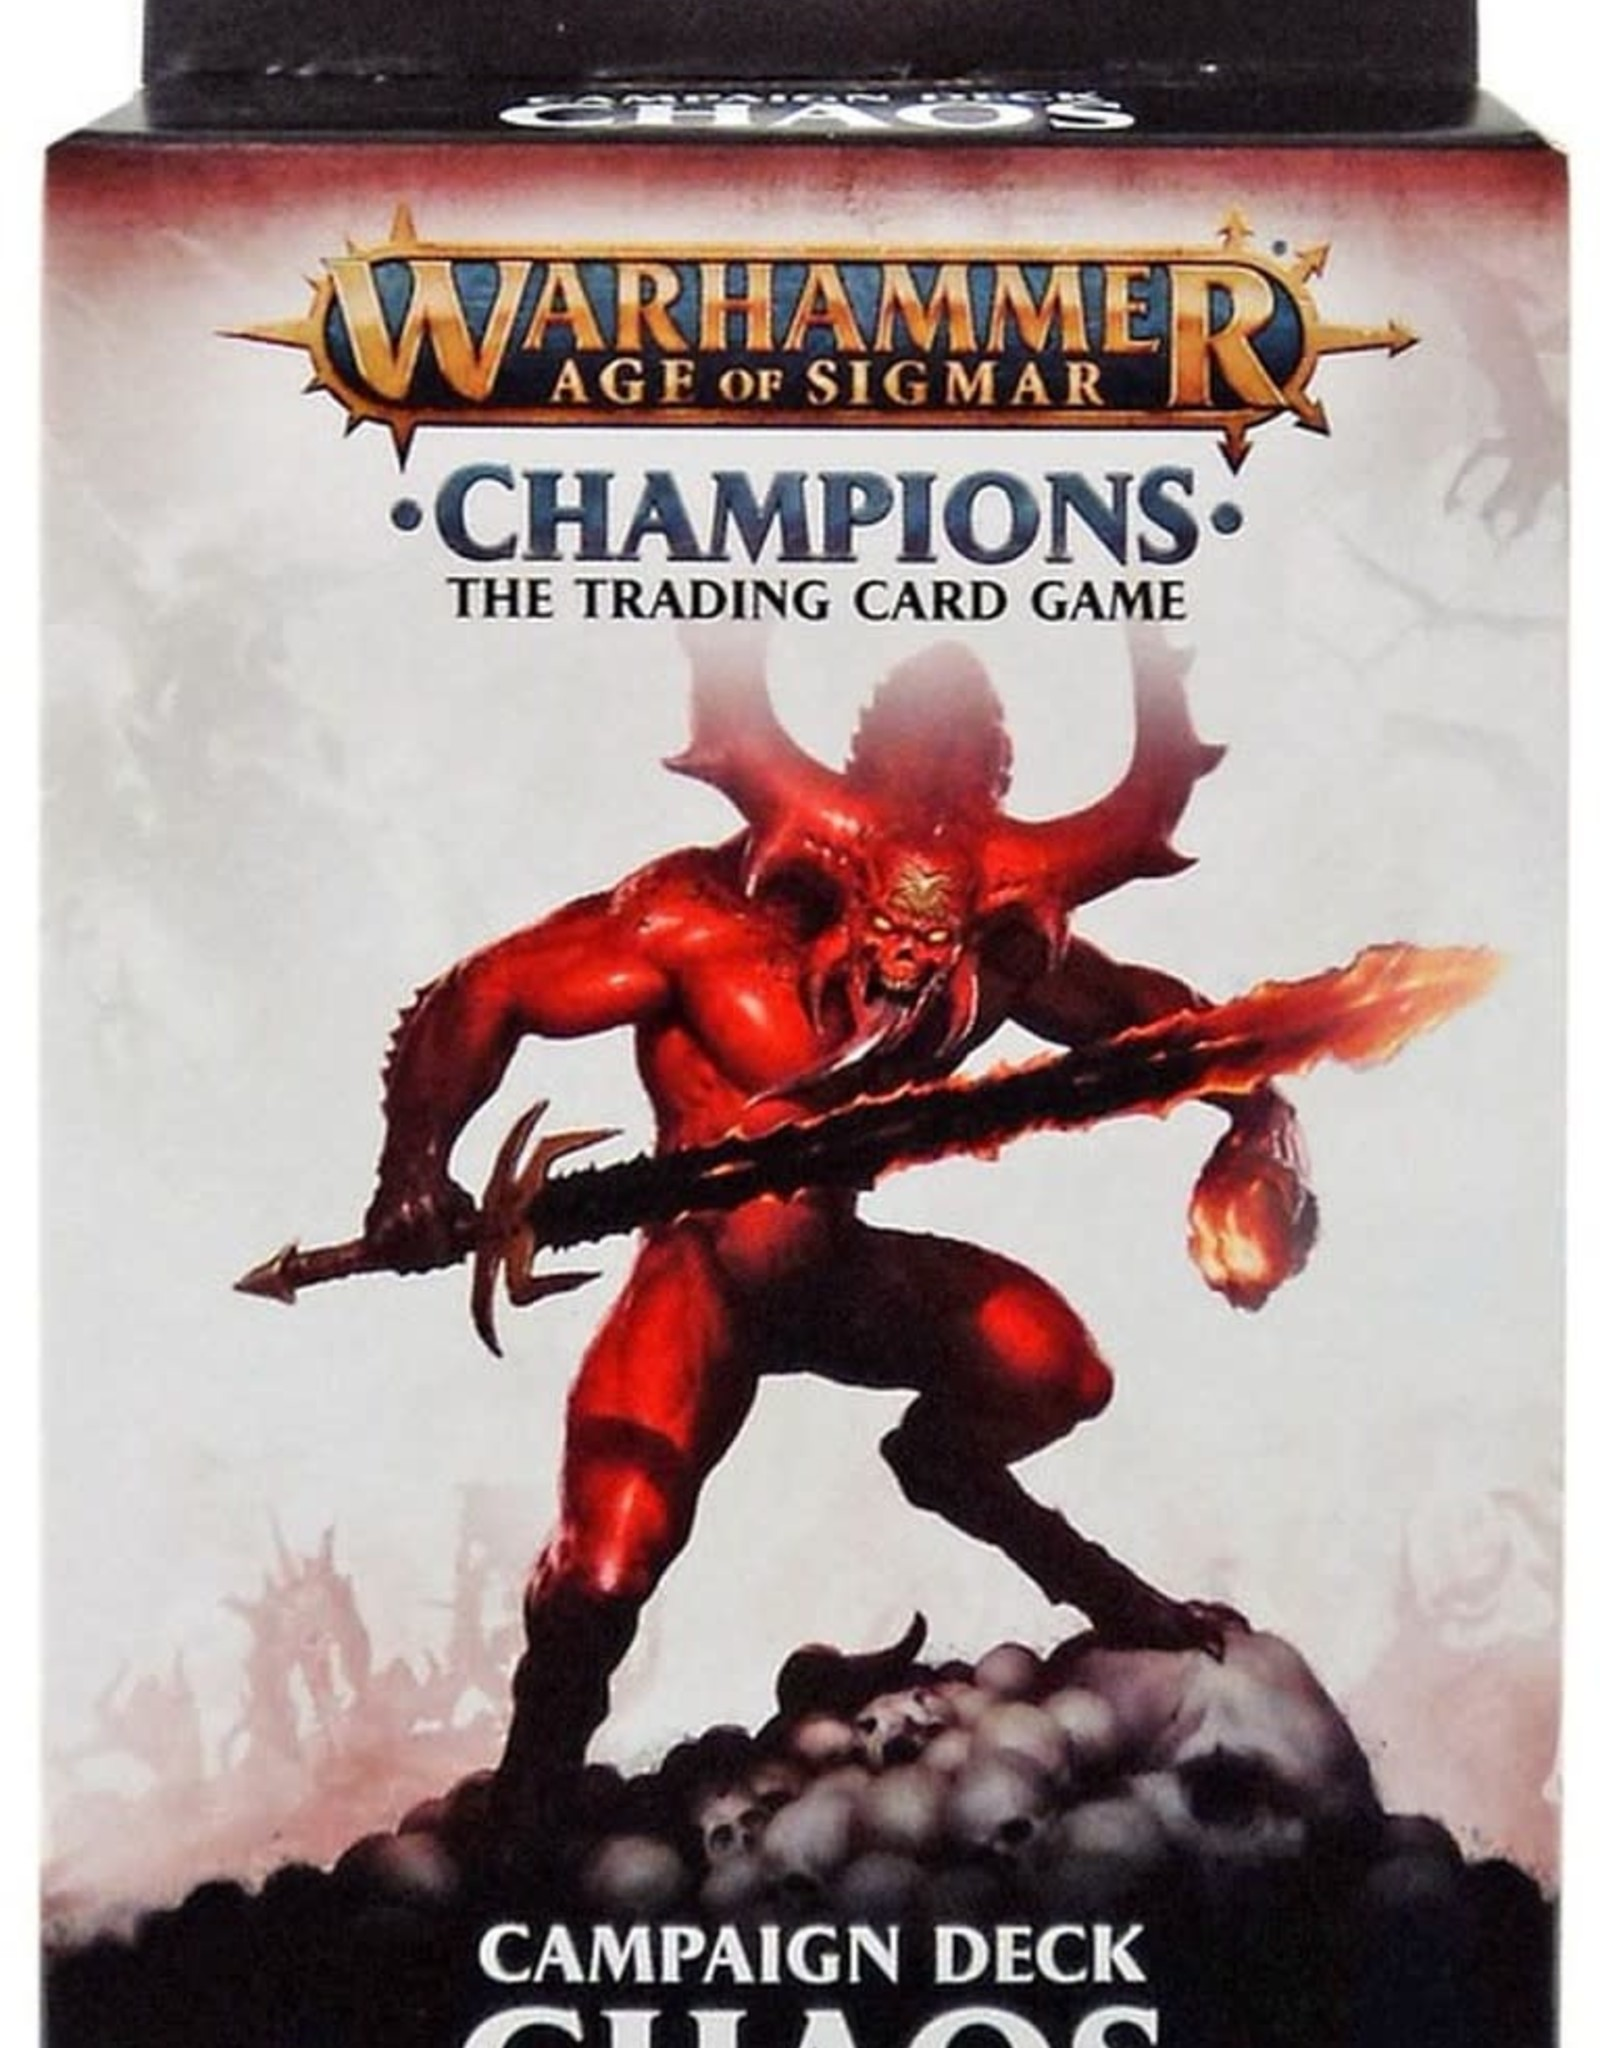 Warhammer:  Champion Deck Chaos